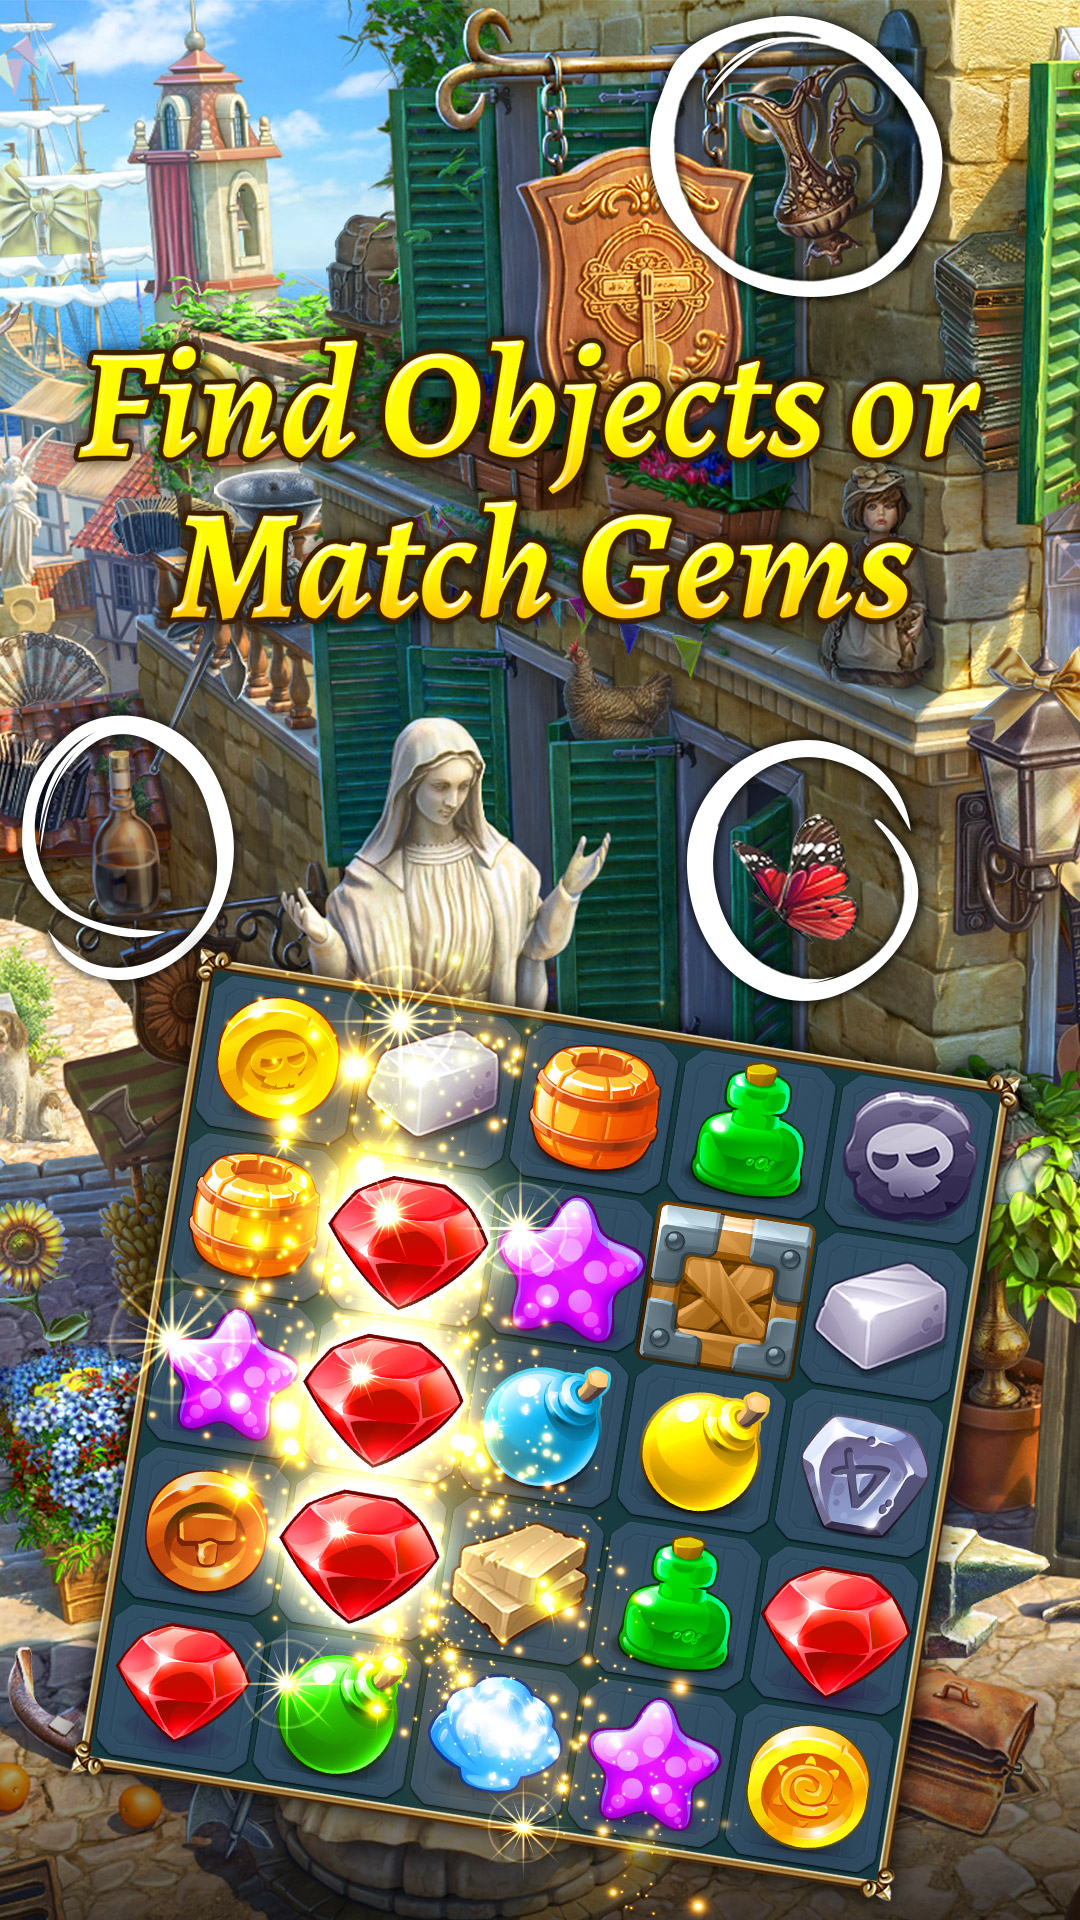 The Hidden Treasures: Seek & Find Mystery Objects